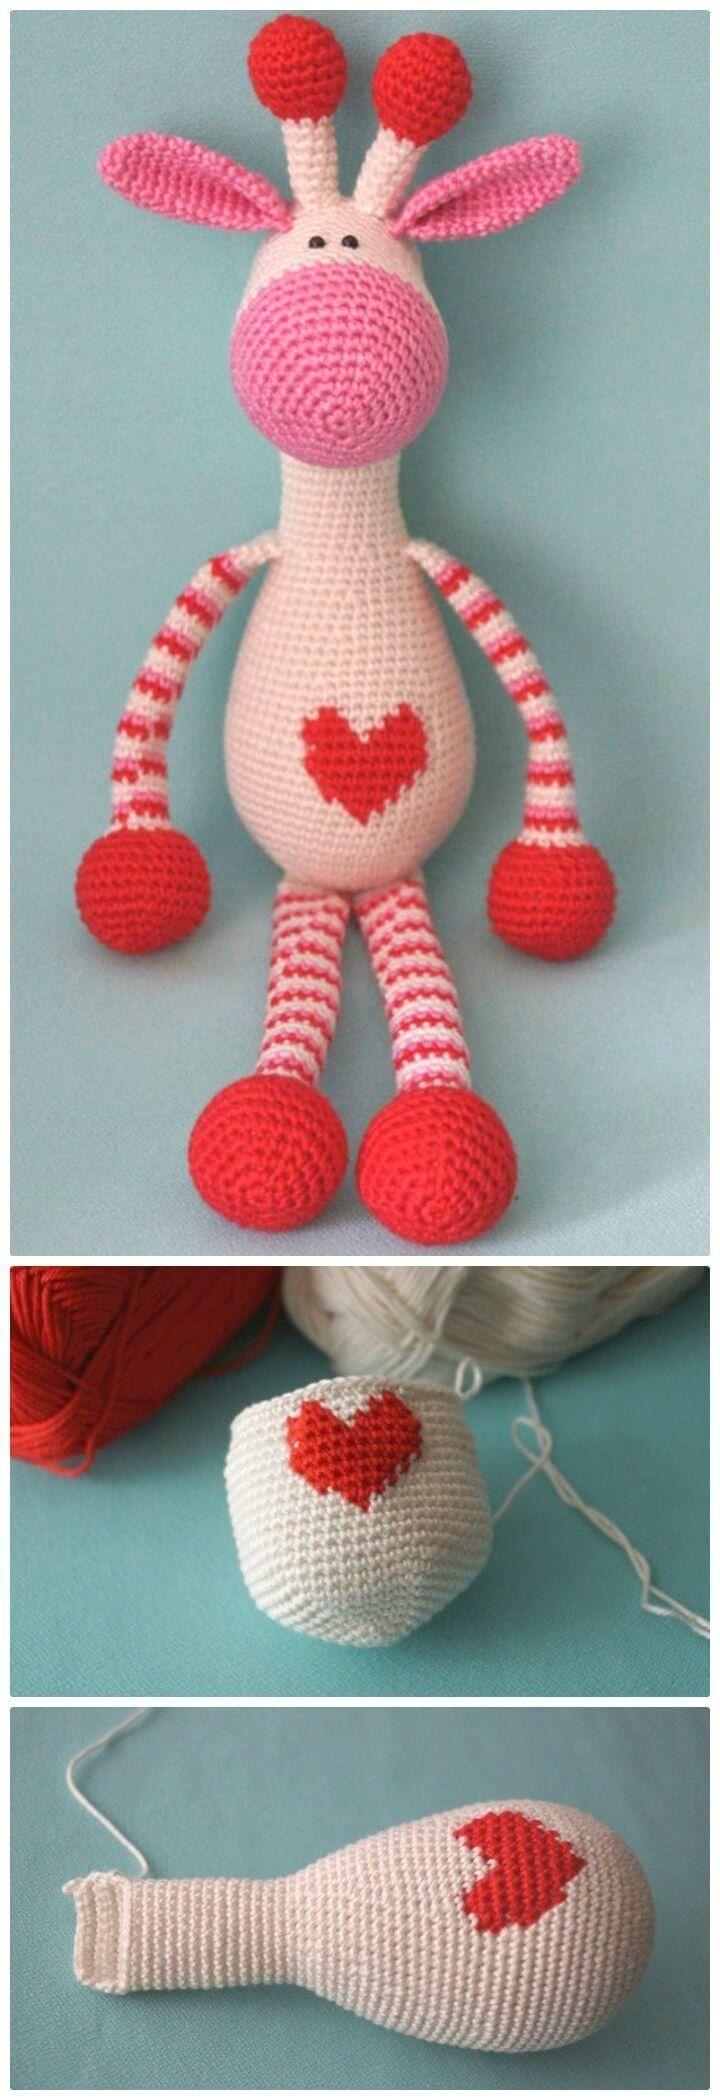 32+ Marvelous Image of Crochet Giraffe Pattern #crochetgiraffepattern